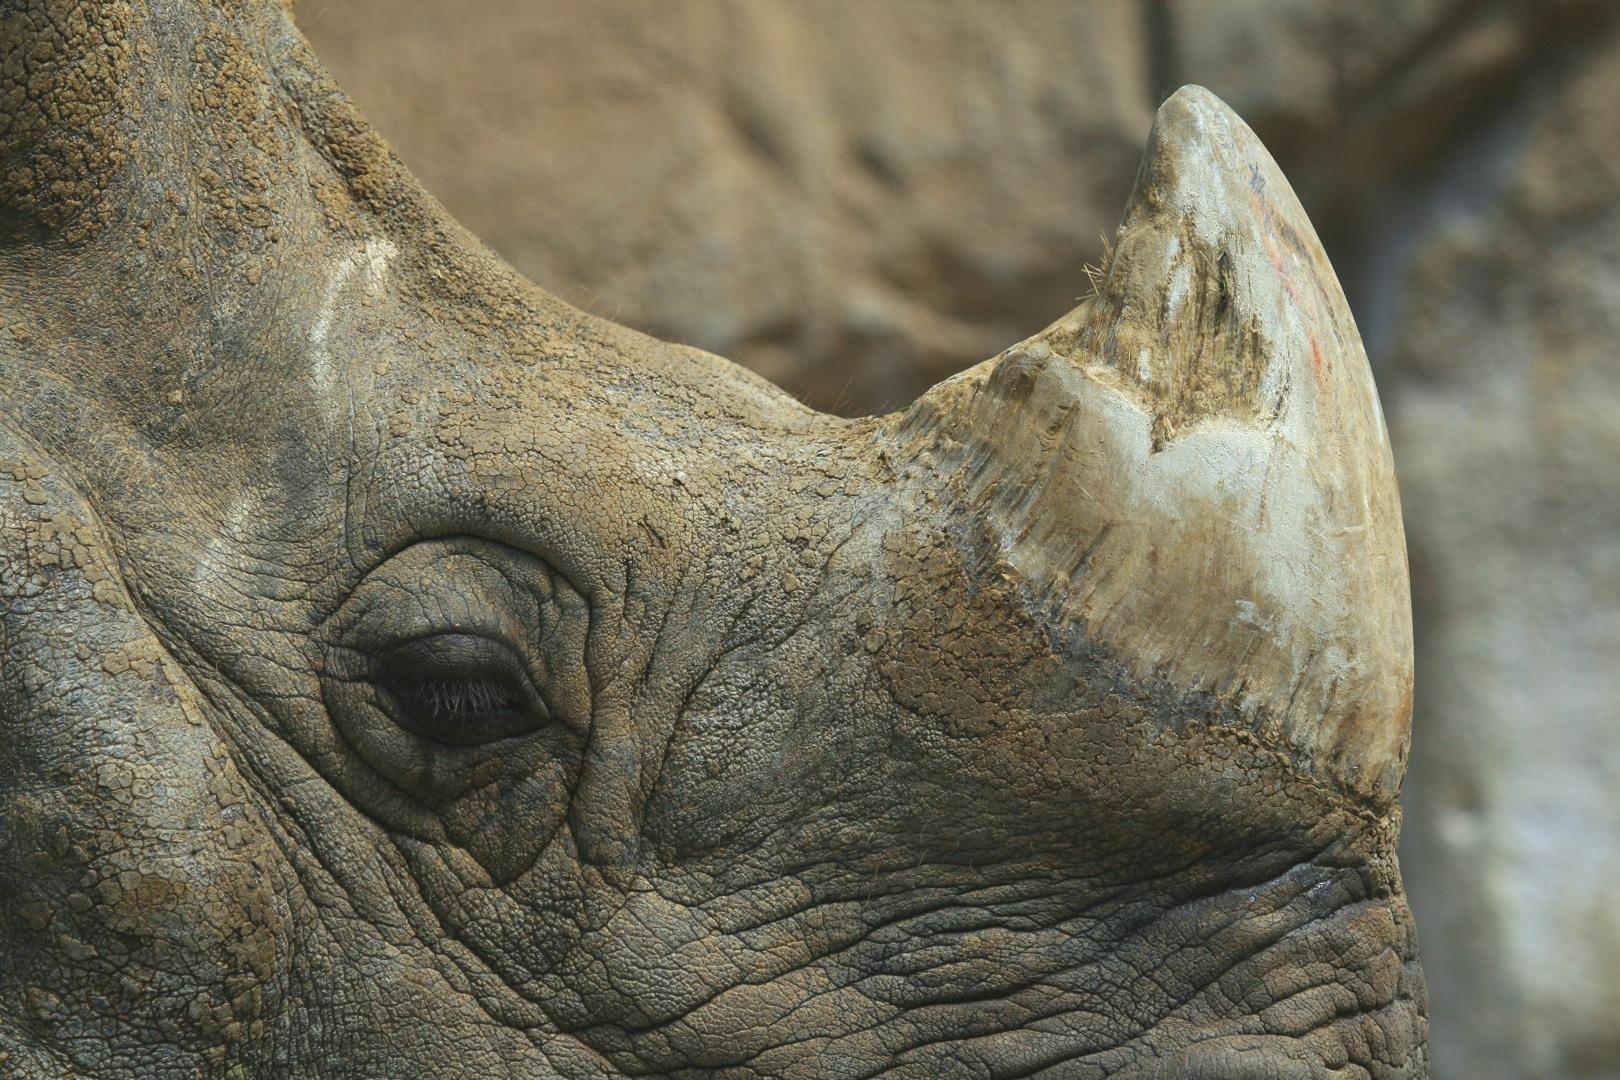 Wildlife trade argumentative essay